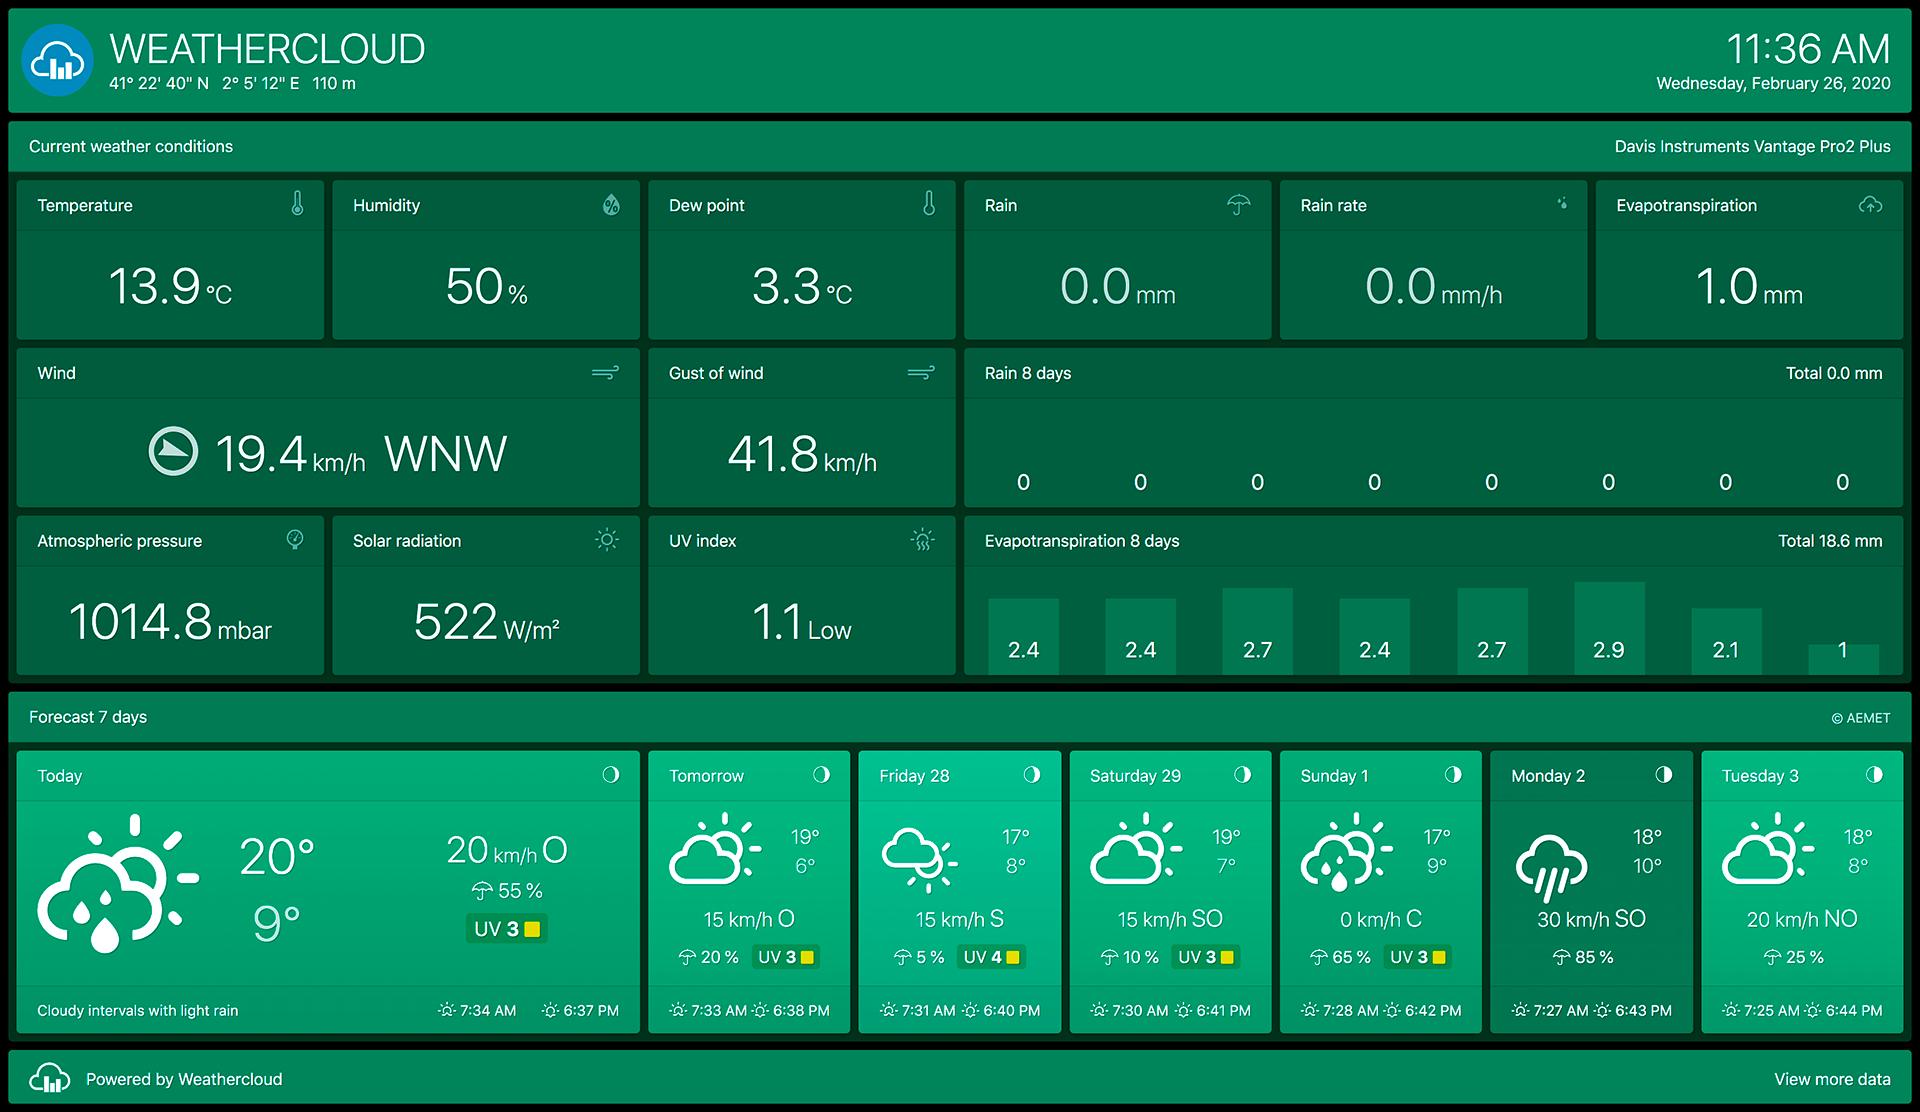 Agro (ET) dashboard in Emerald (Light green) theme